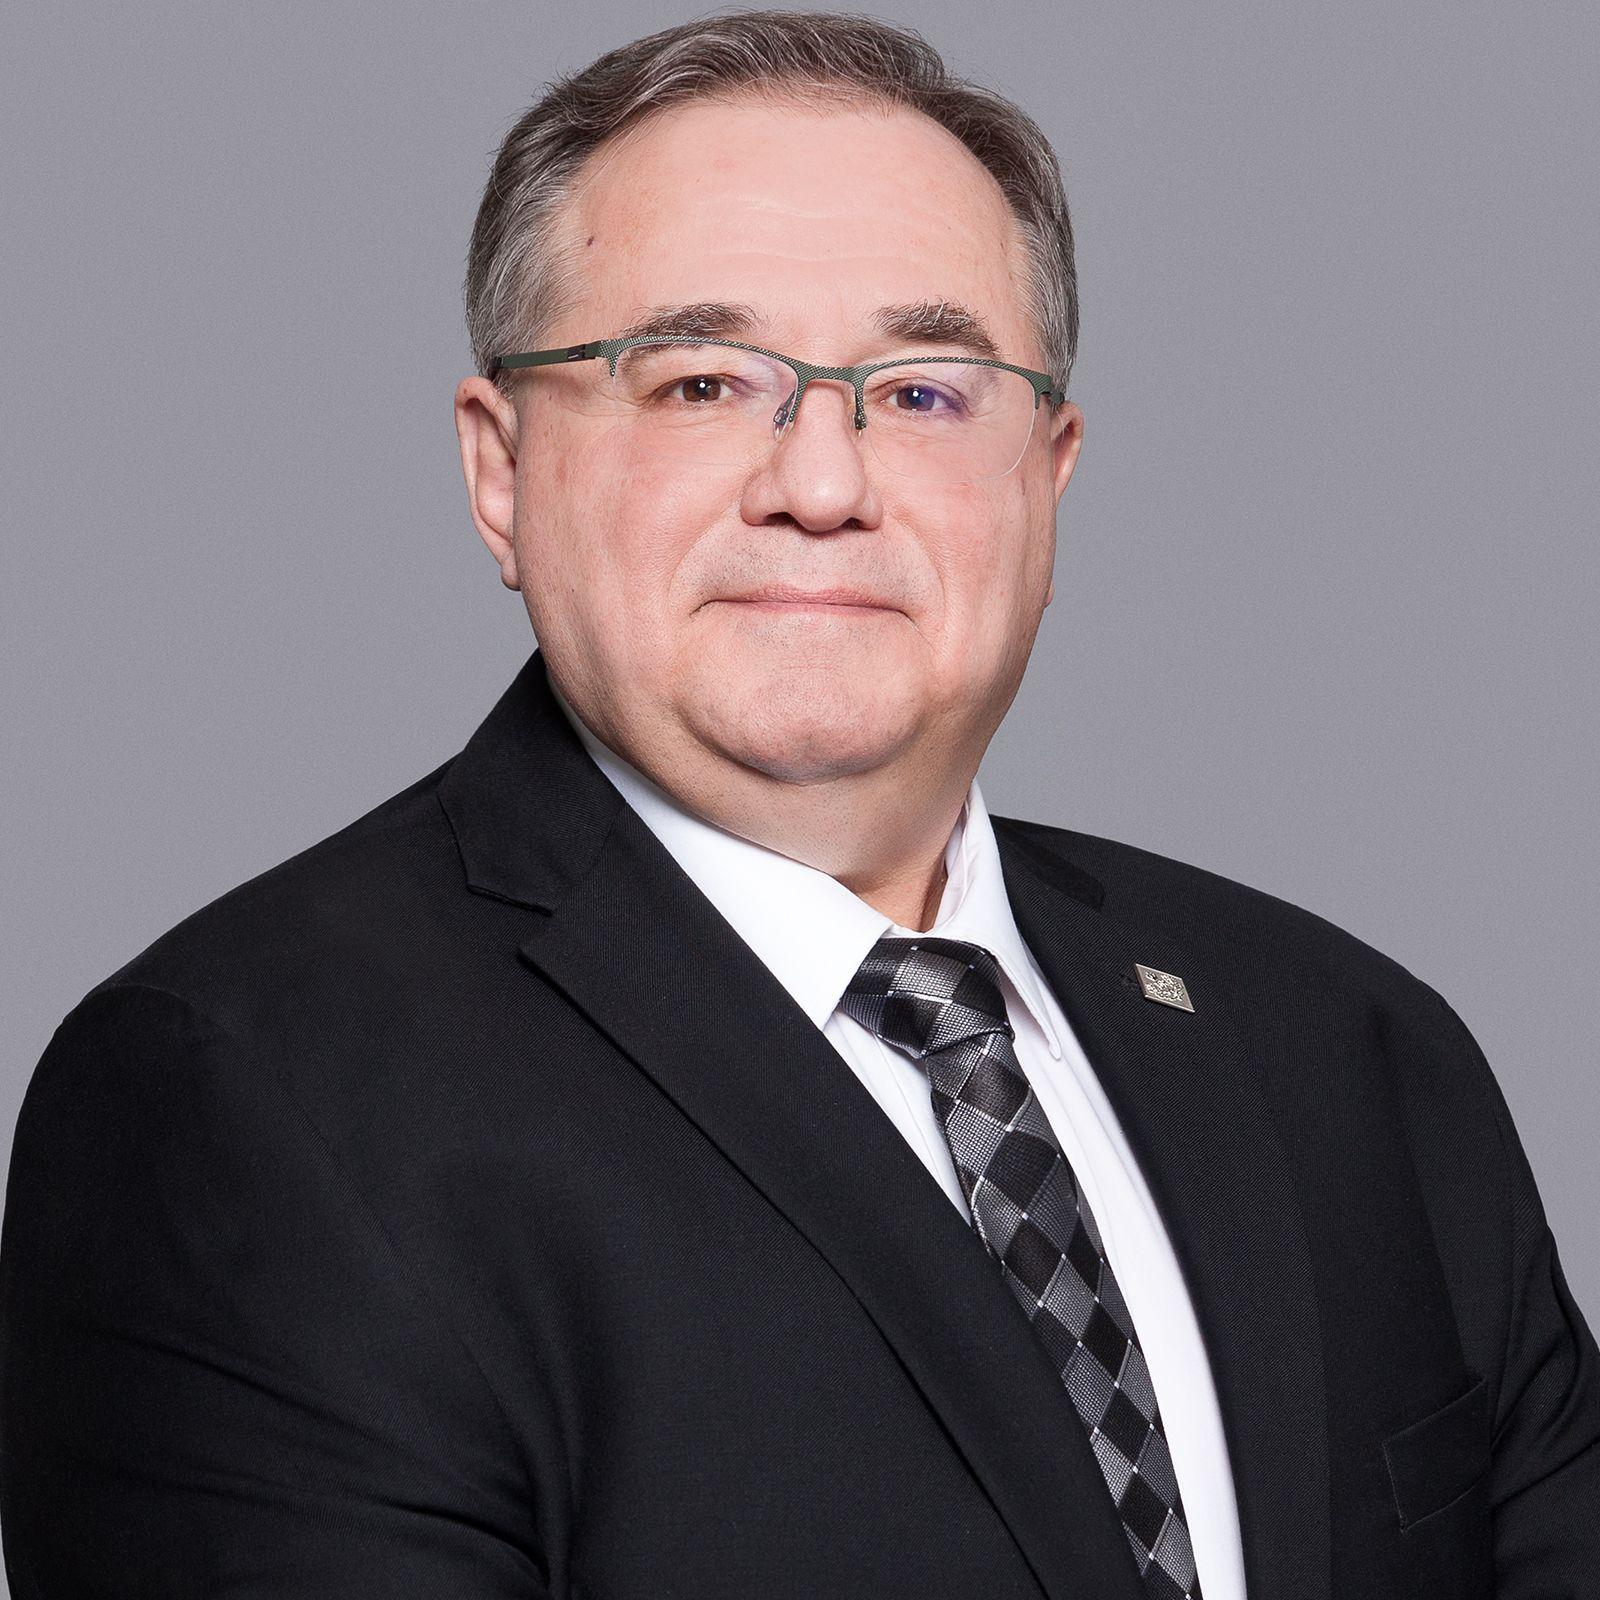 Peter Marcucci